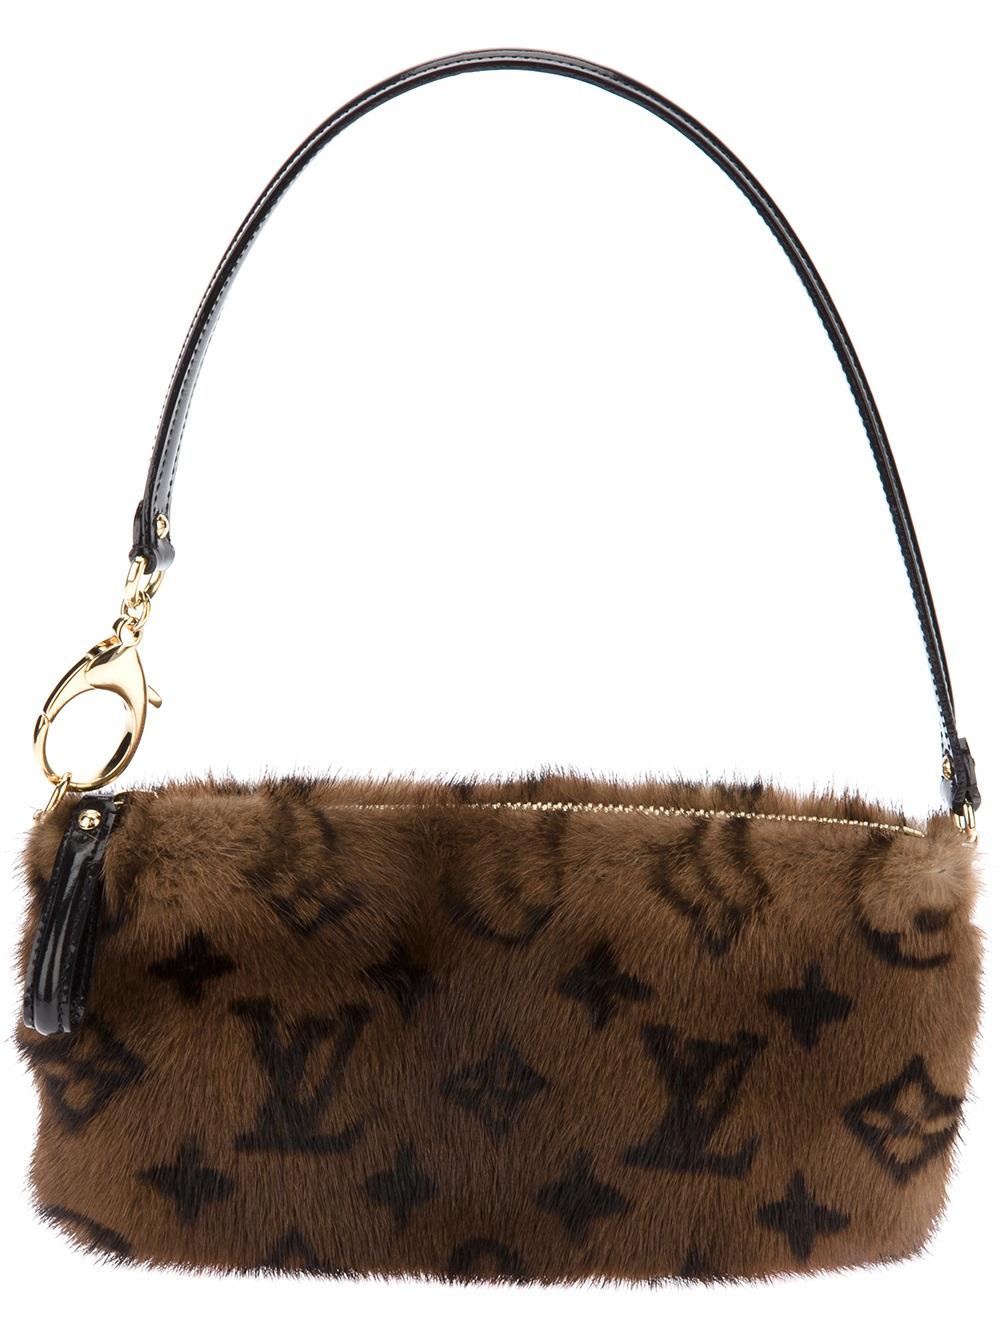 6c7f8c60f44f Lyst - Louis Vuitton Mink Fur Shoulder Bag in Brown